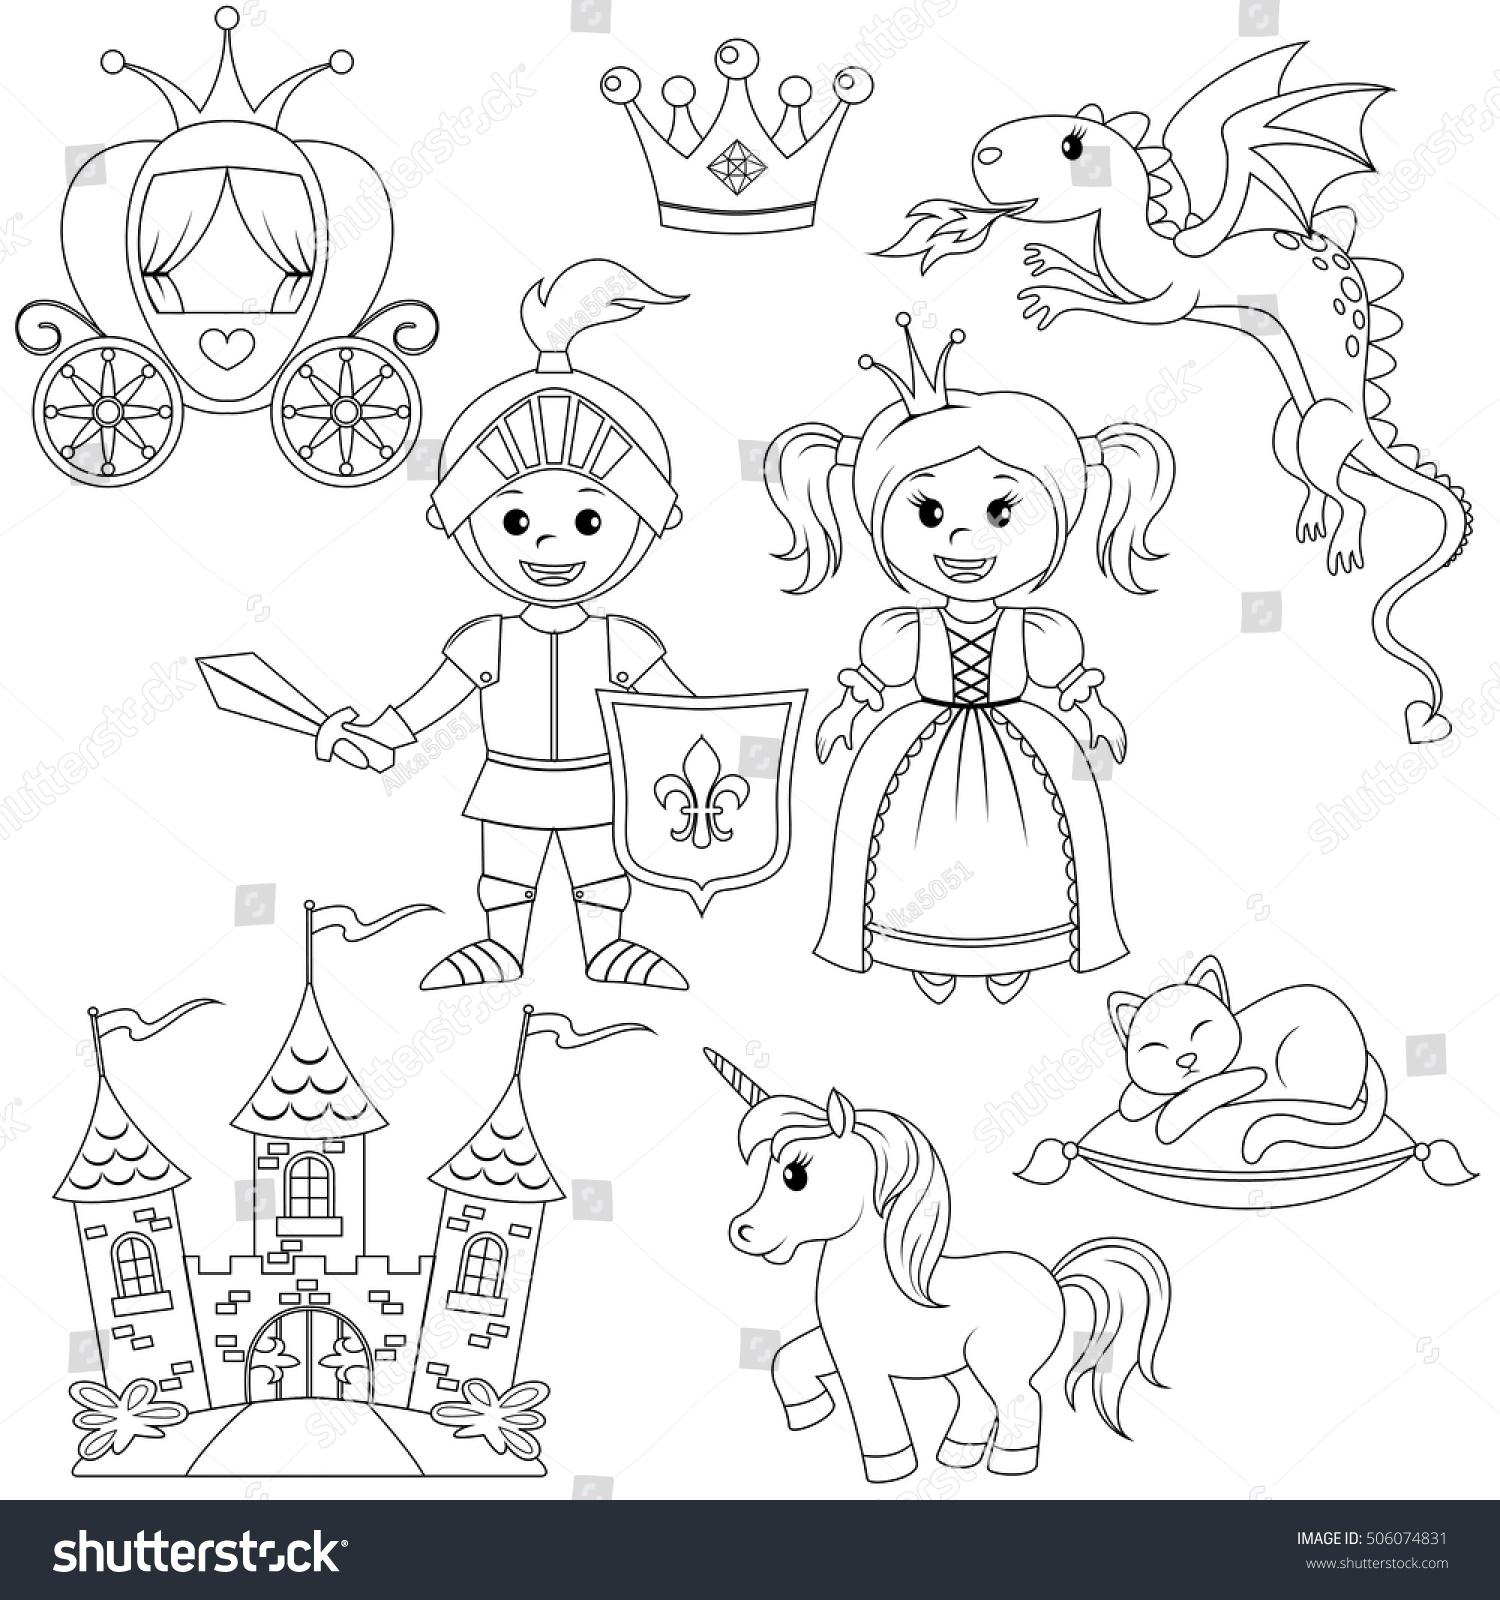 Coloring book princess crowns - Fairytale Princess Knight Castle Carriage Unicorn Crown Dragon Cat